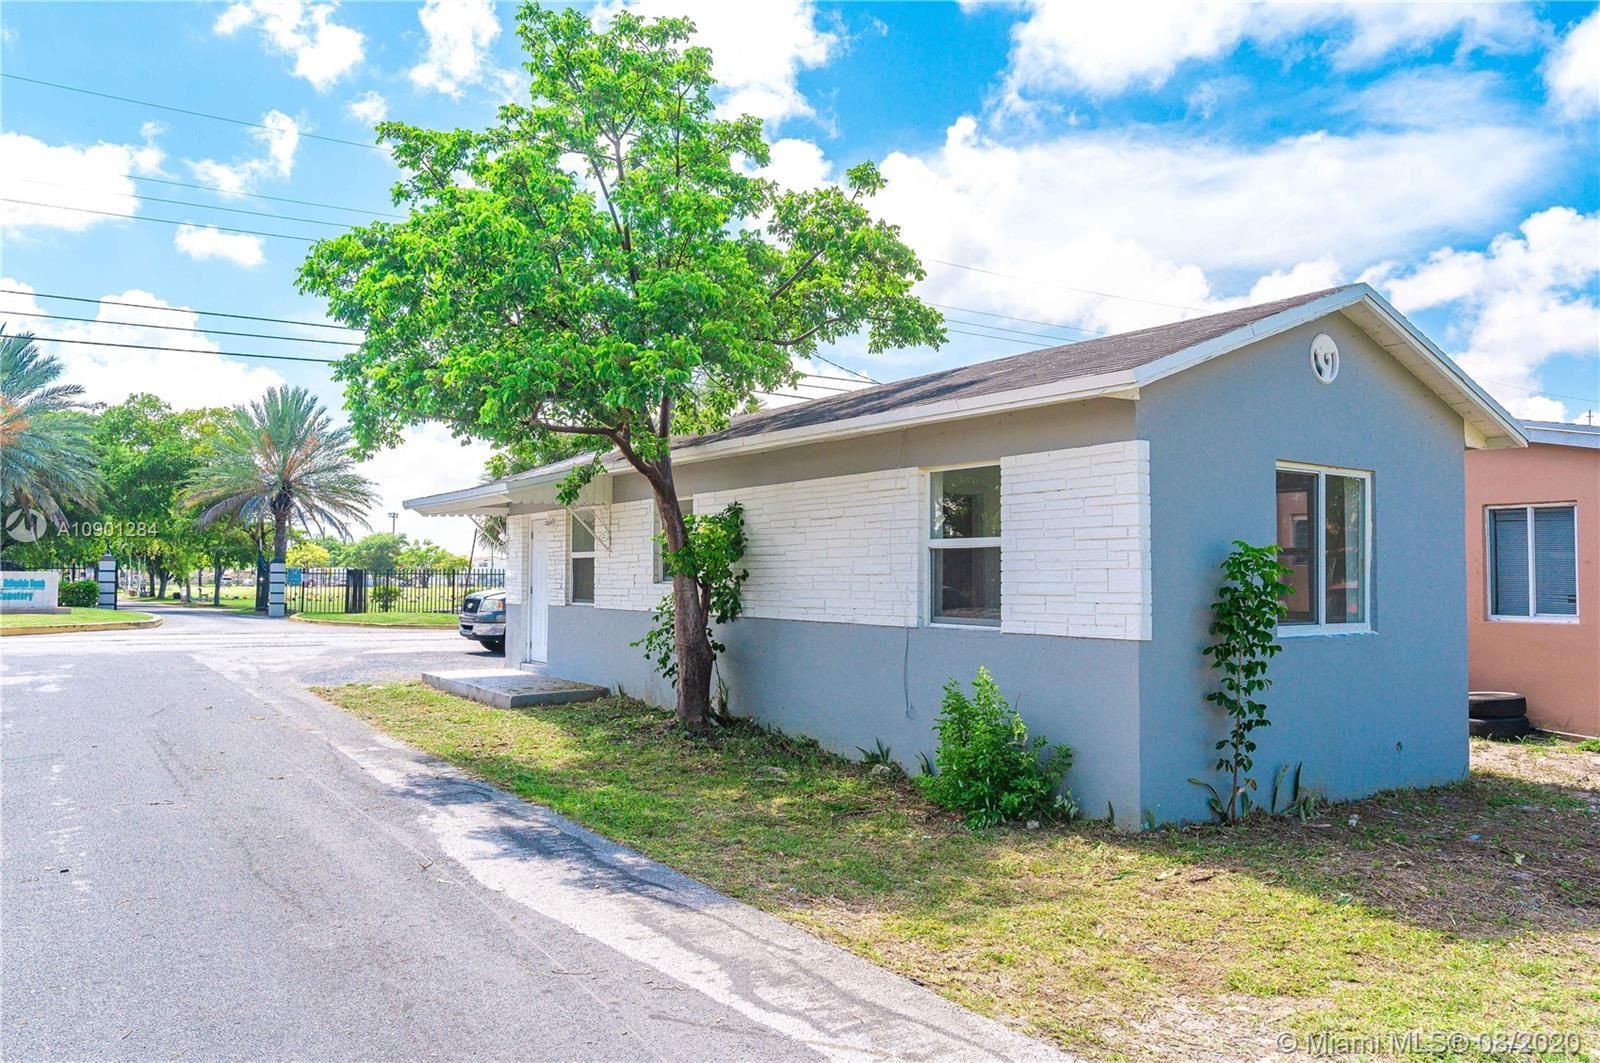 800 NW 6th Ave, Hallandale Beach, FL 33009 - #: A10901284